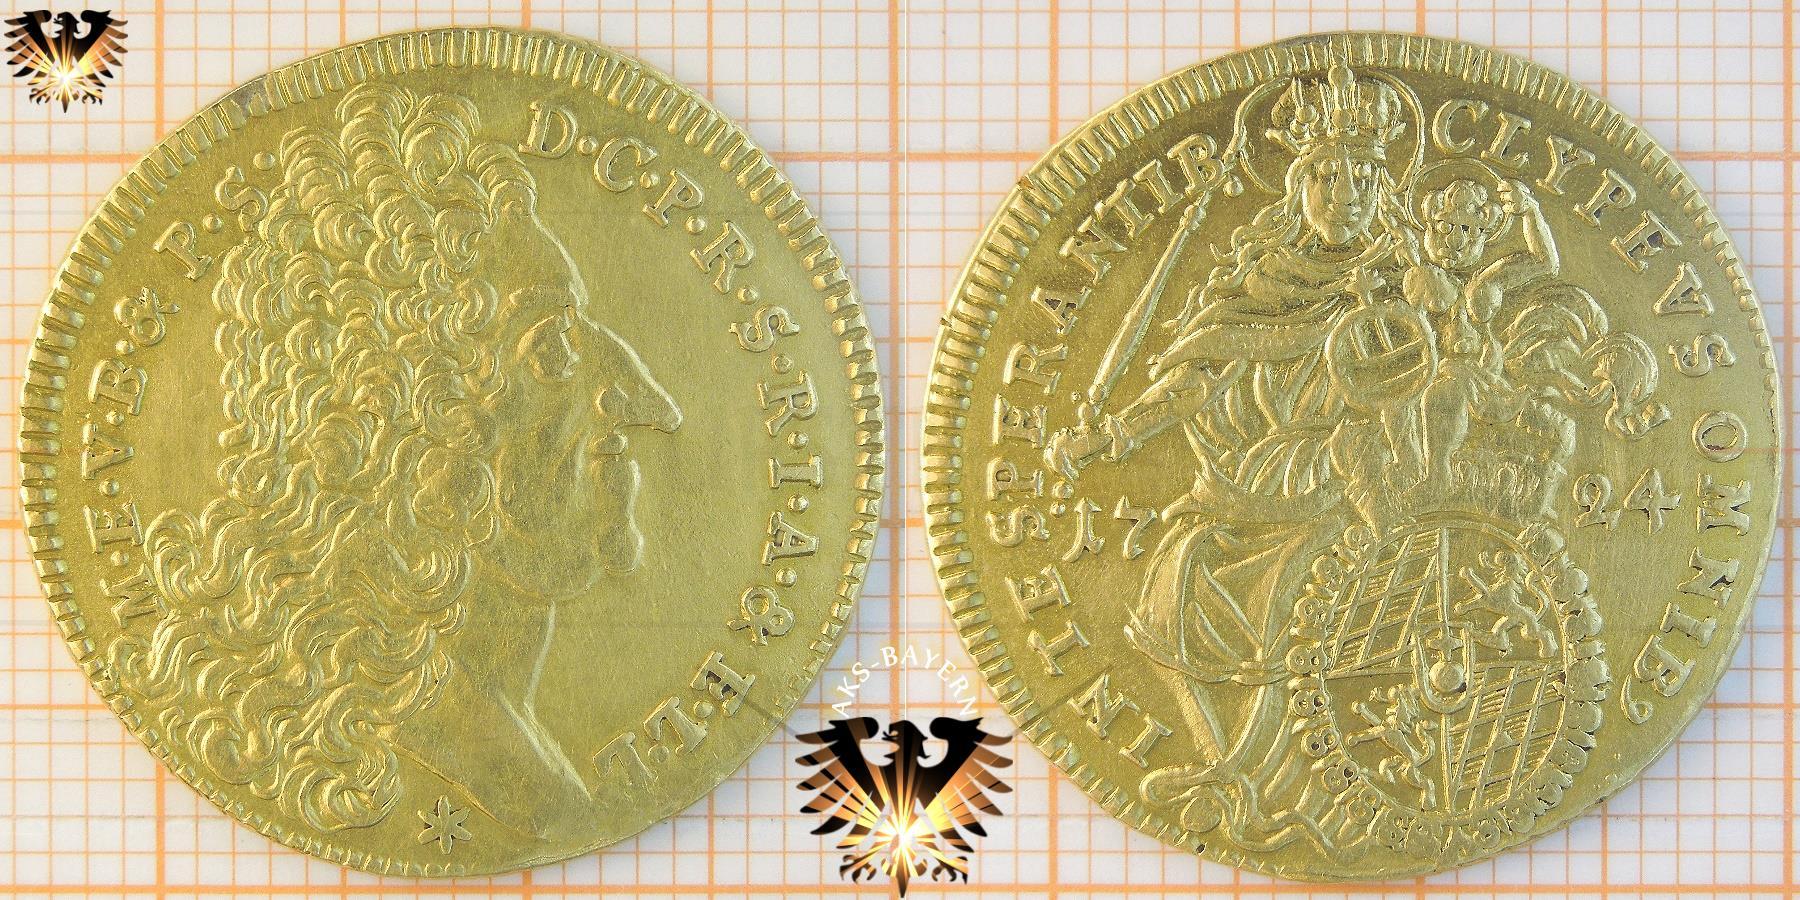 Bayern Gold Münze 1724 Maximilian Ii Max Dor Goldmünze